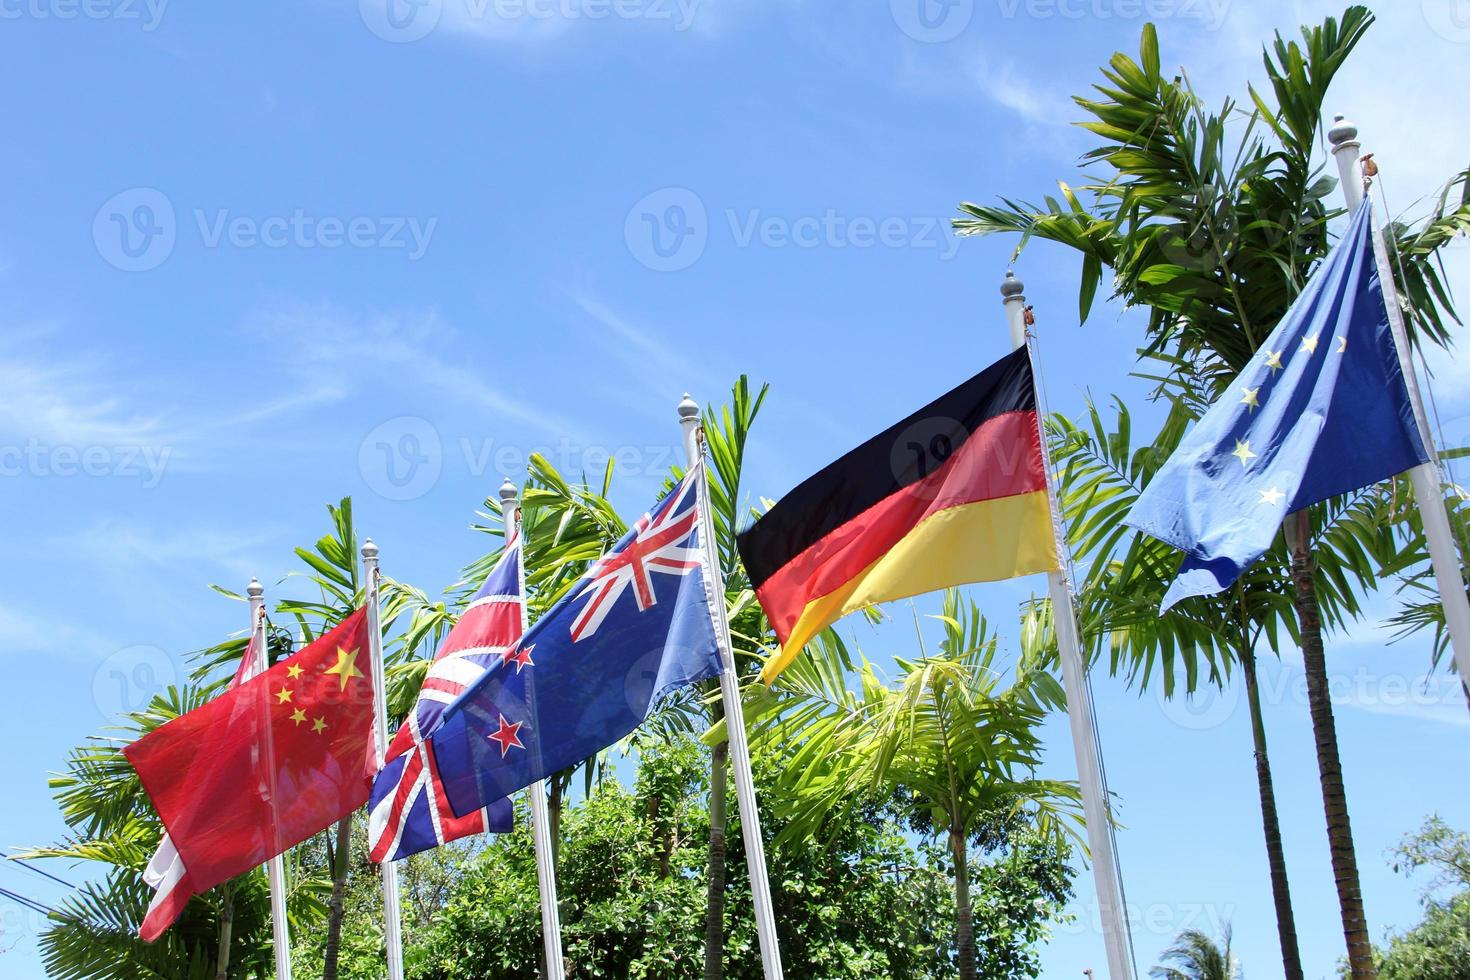 drapeau international ciel bleu photo